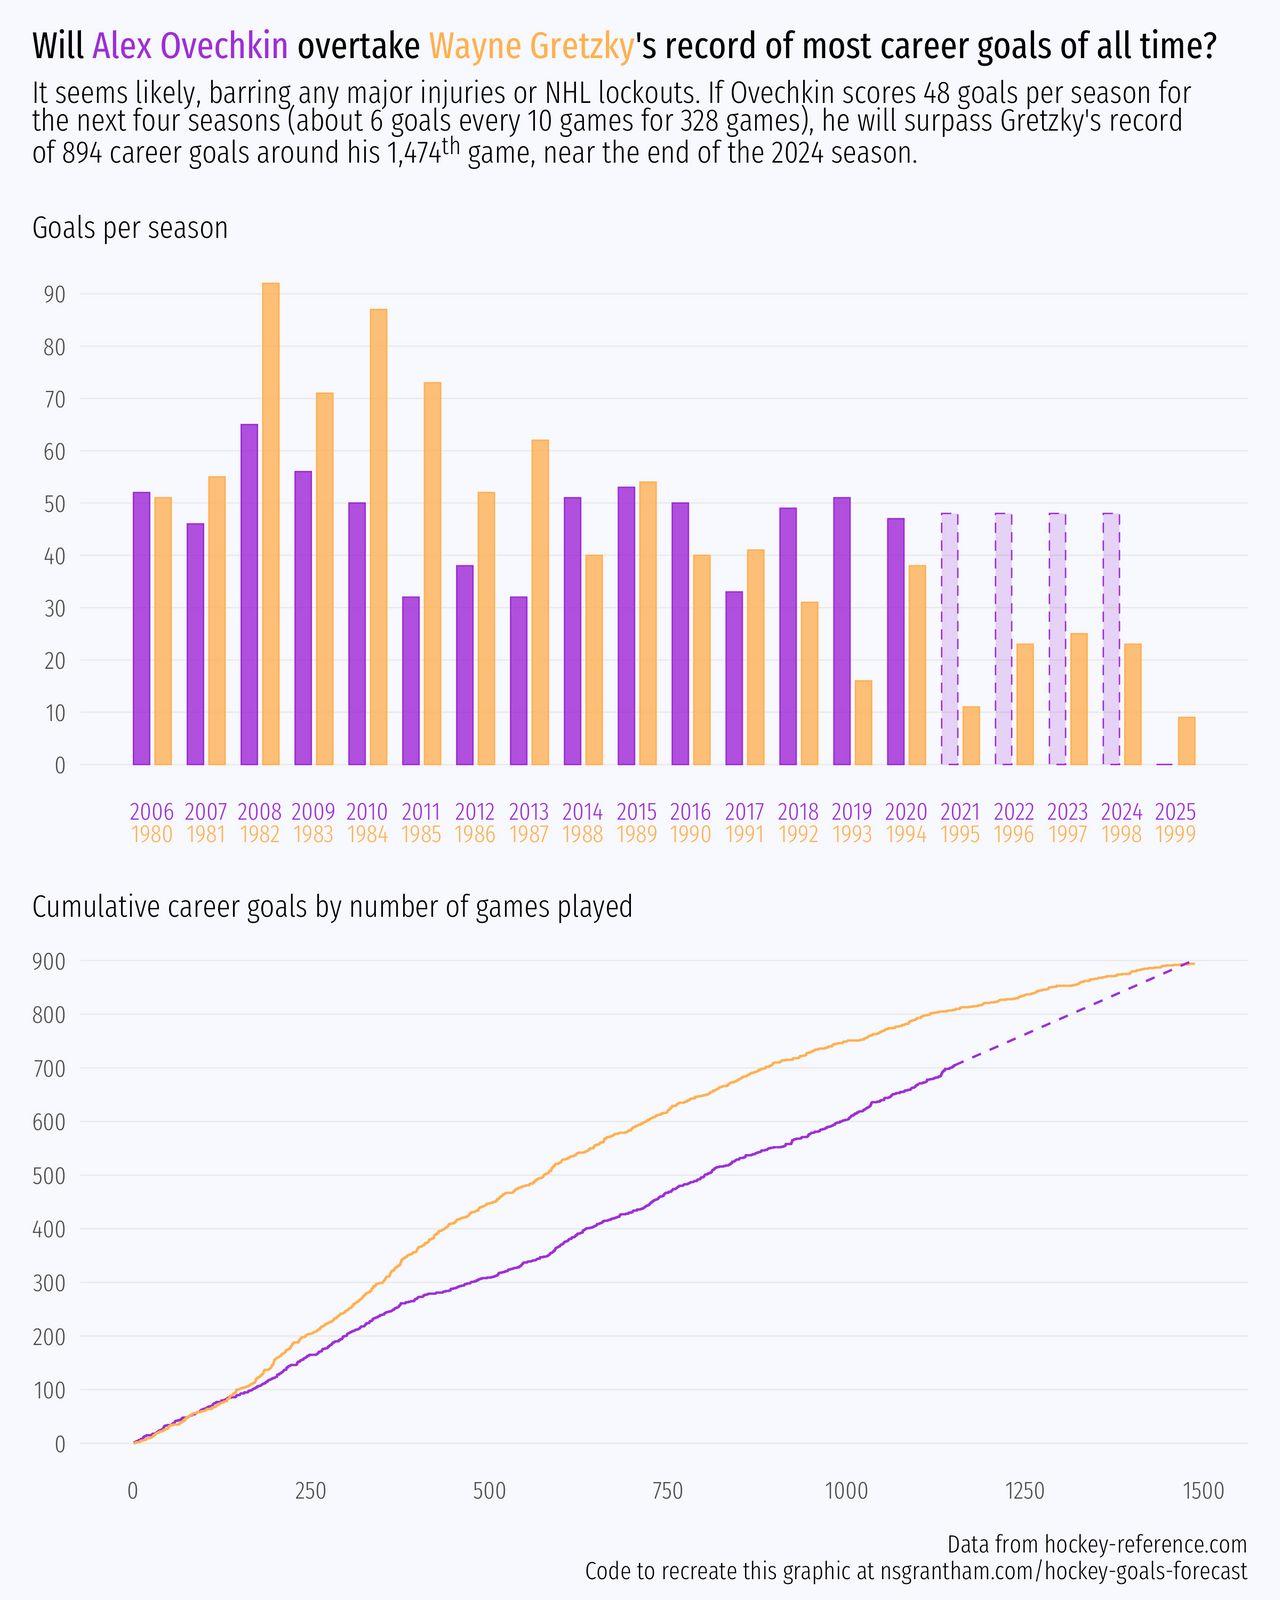 Wayne Gretzky vs. Alex Ovechkin